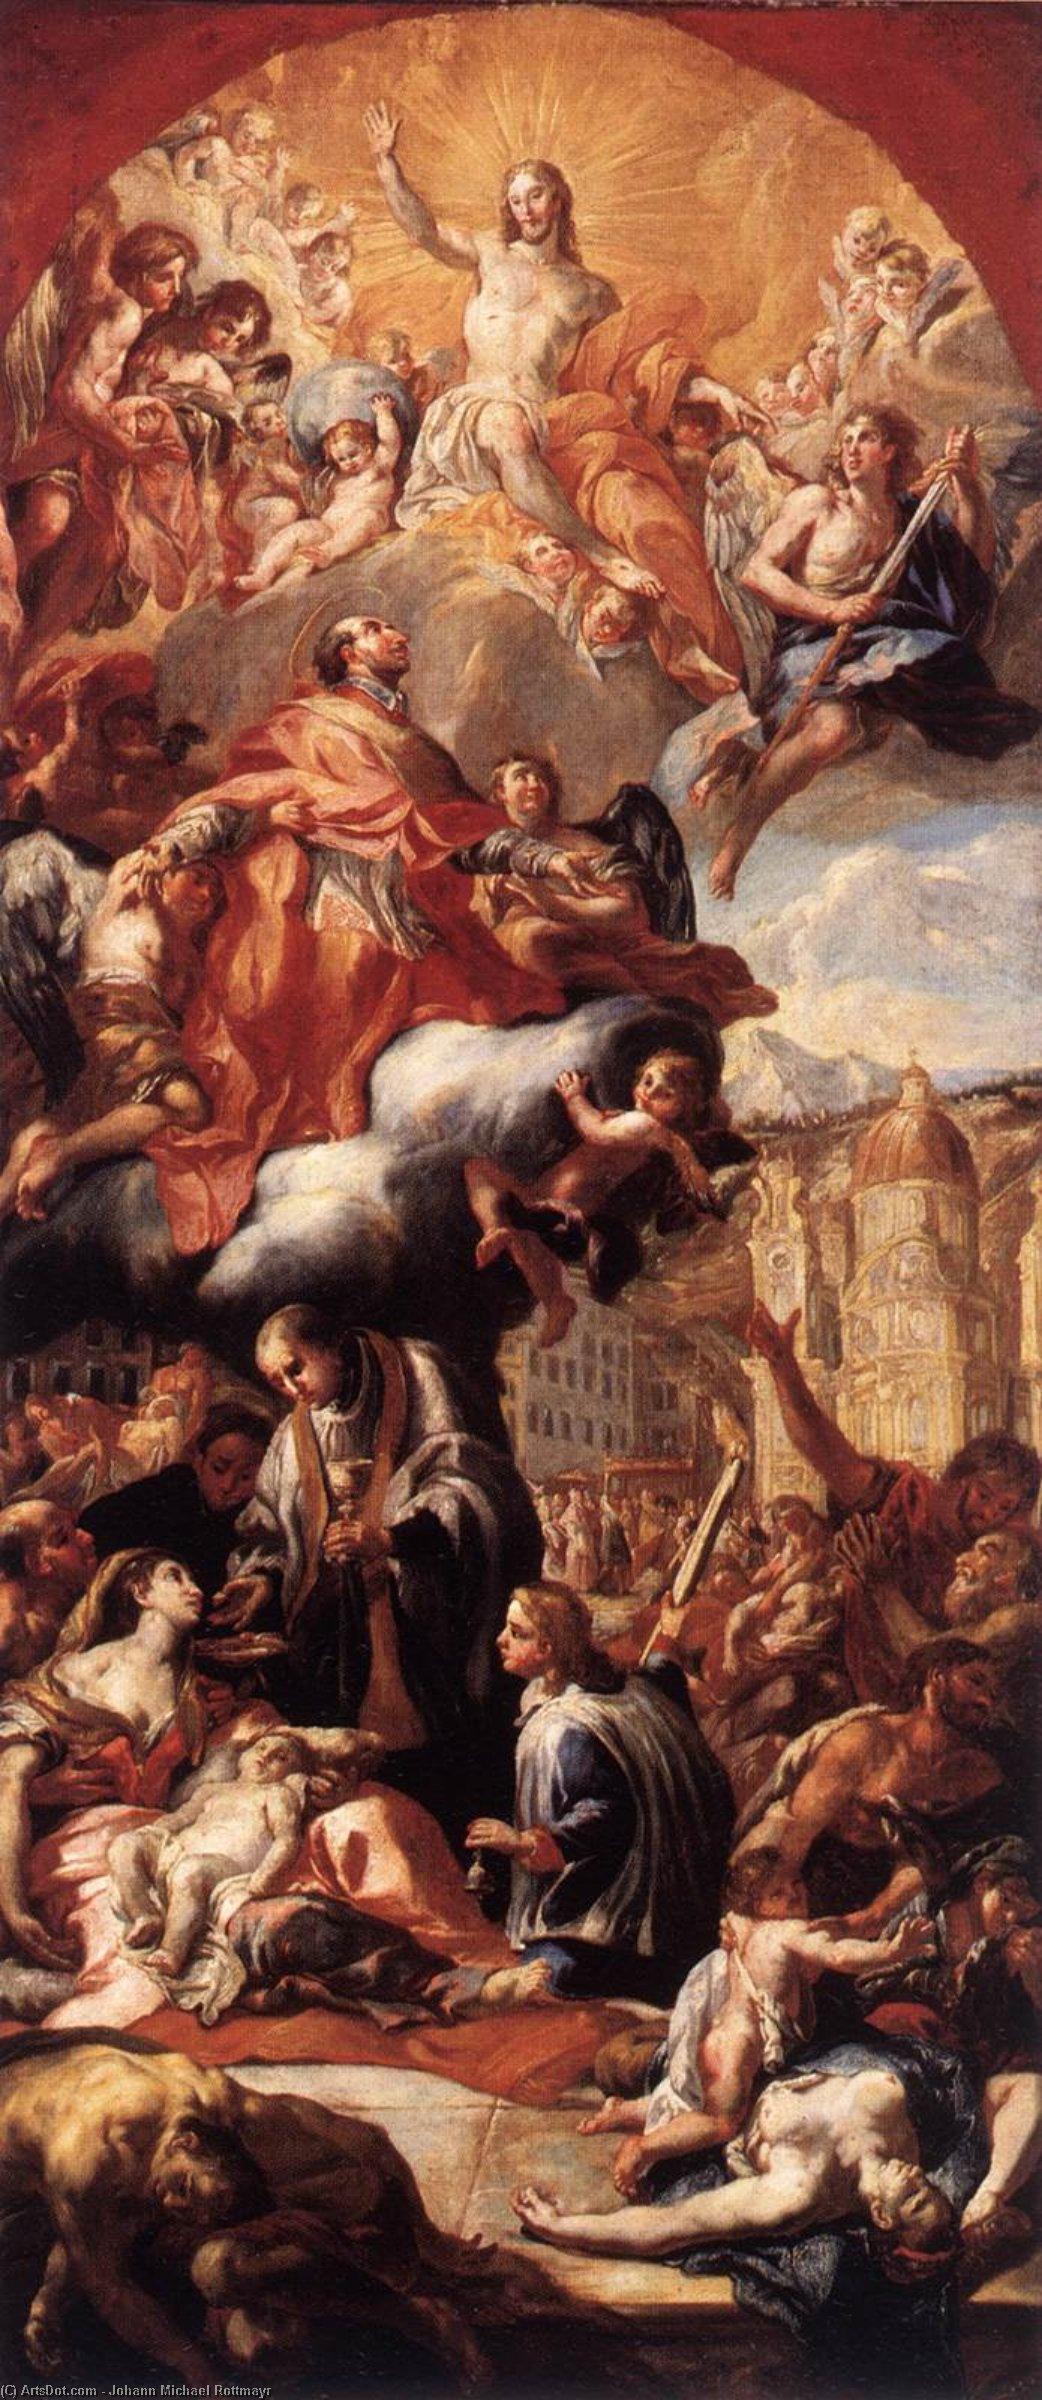 Wikioo.org - The Encyclopedia of Fine Arts - Painting, Artwork by Johann Michael Rottmayr - Apotheosis of St Charles Borromeo